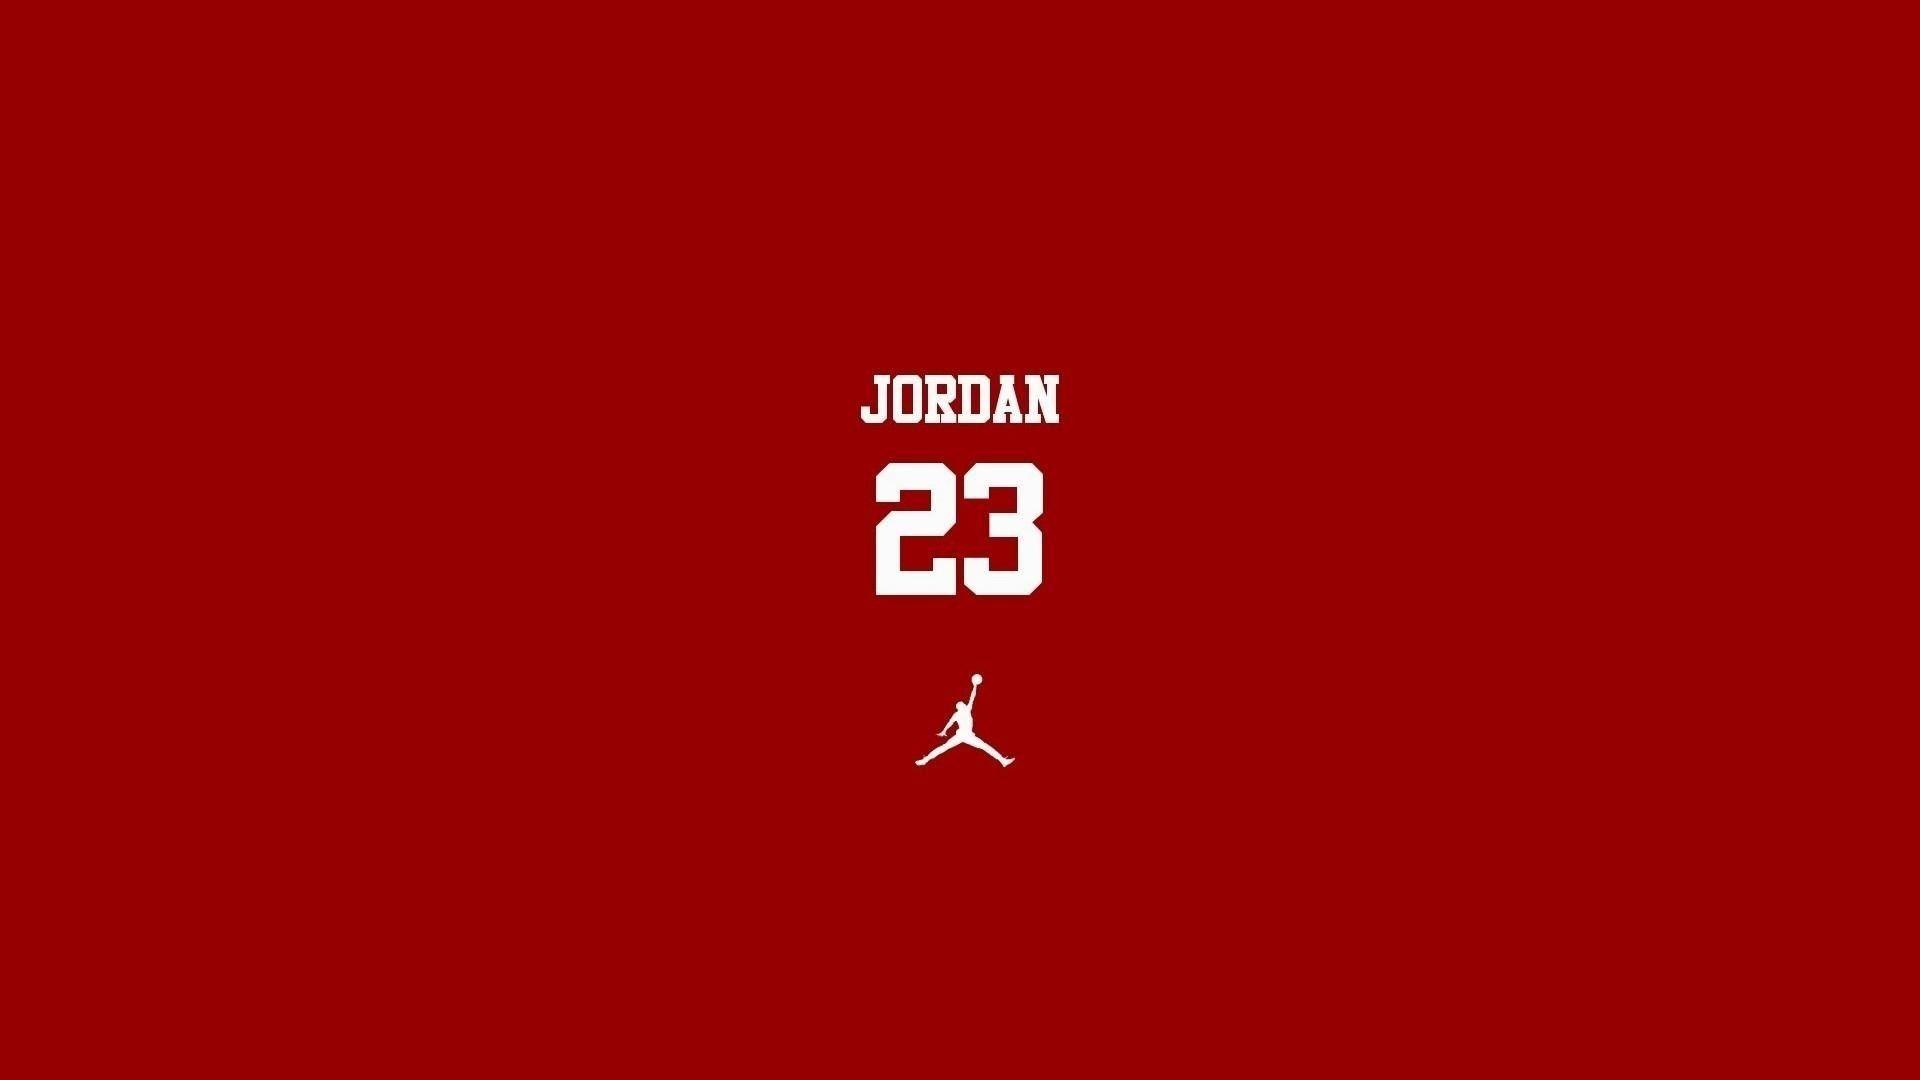 Res: 1920x1080, Jordan 23 Wallpaper ·①